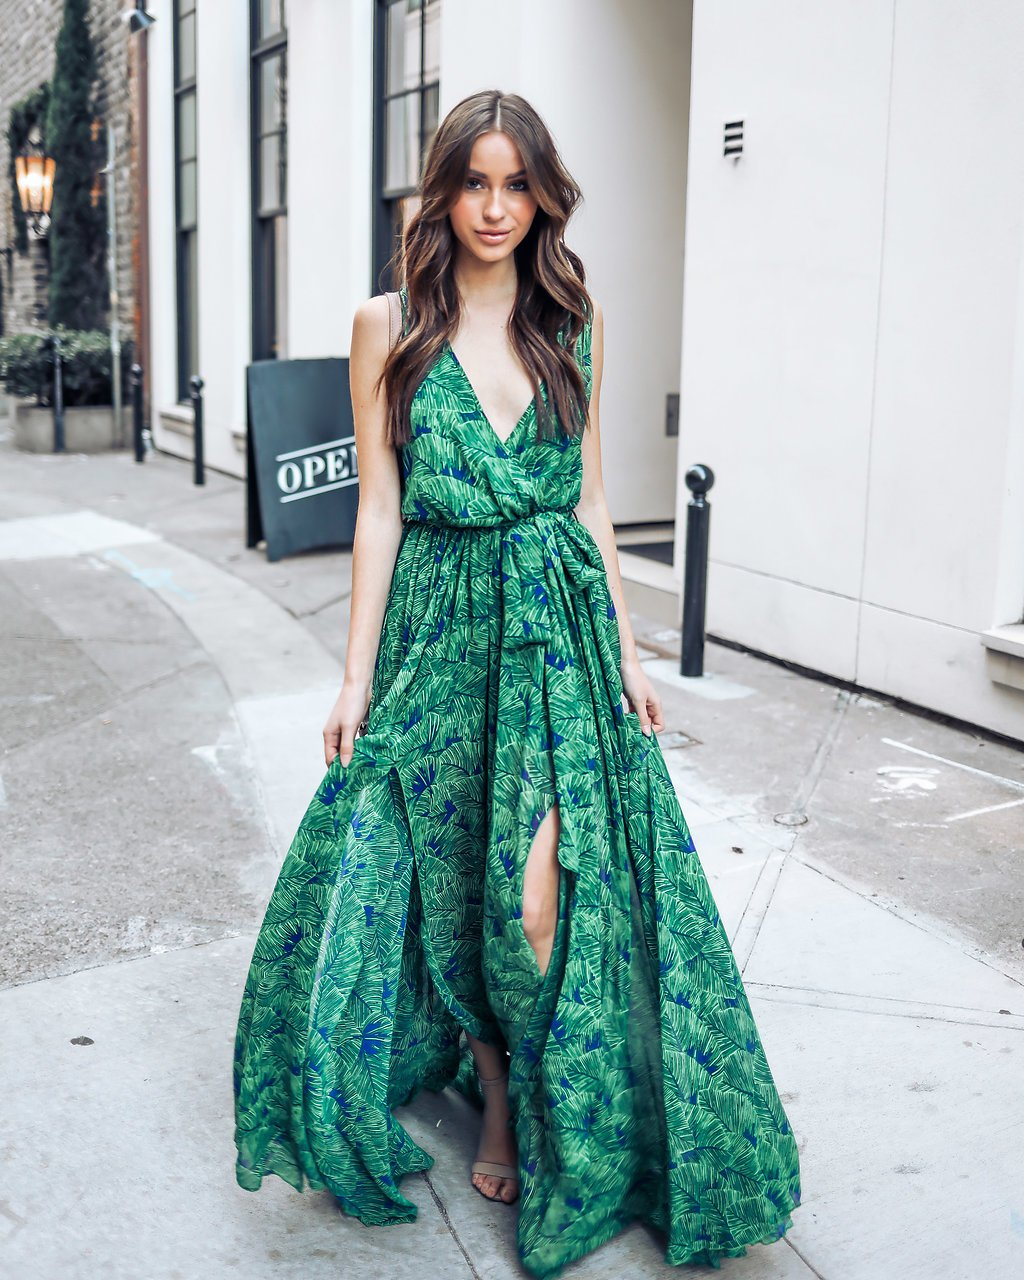 2faa8e64b9 2019 Women s Long Maxi Green Dress Sleeveless V-neck Chiffon Dress Empire  Wrap Long Dress